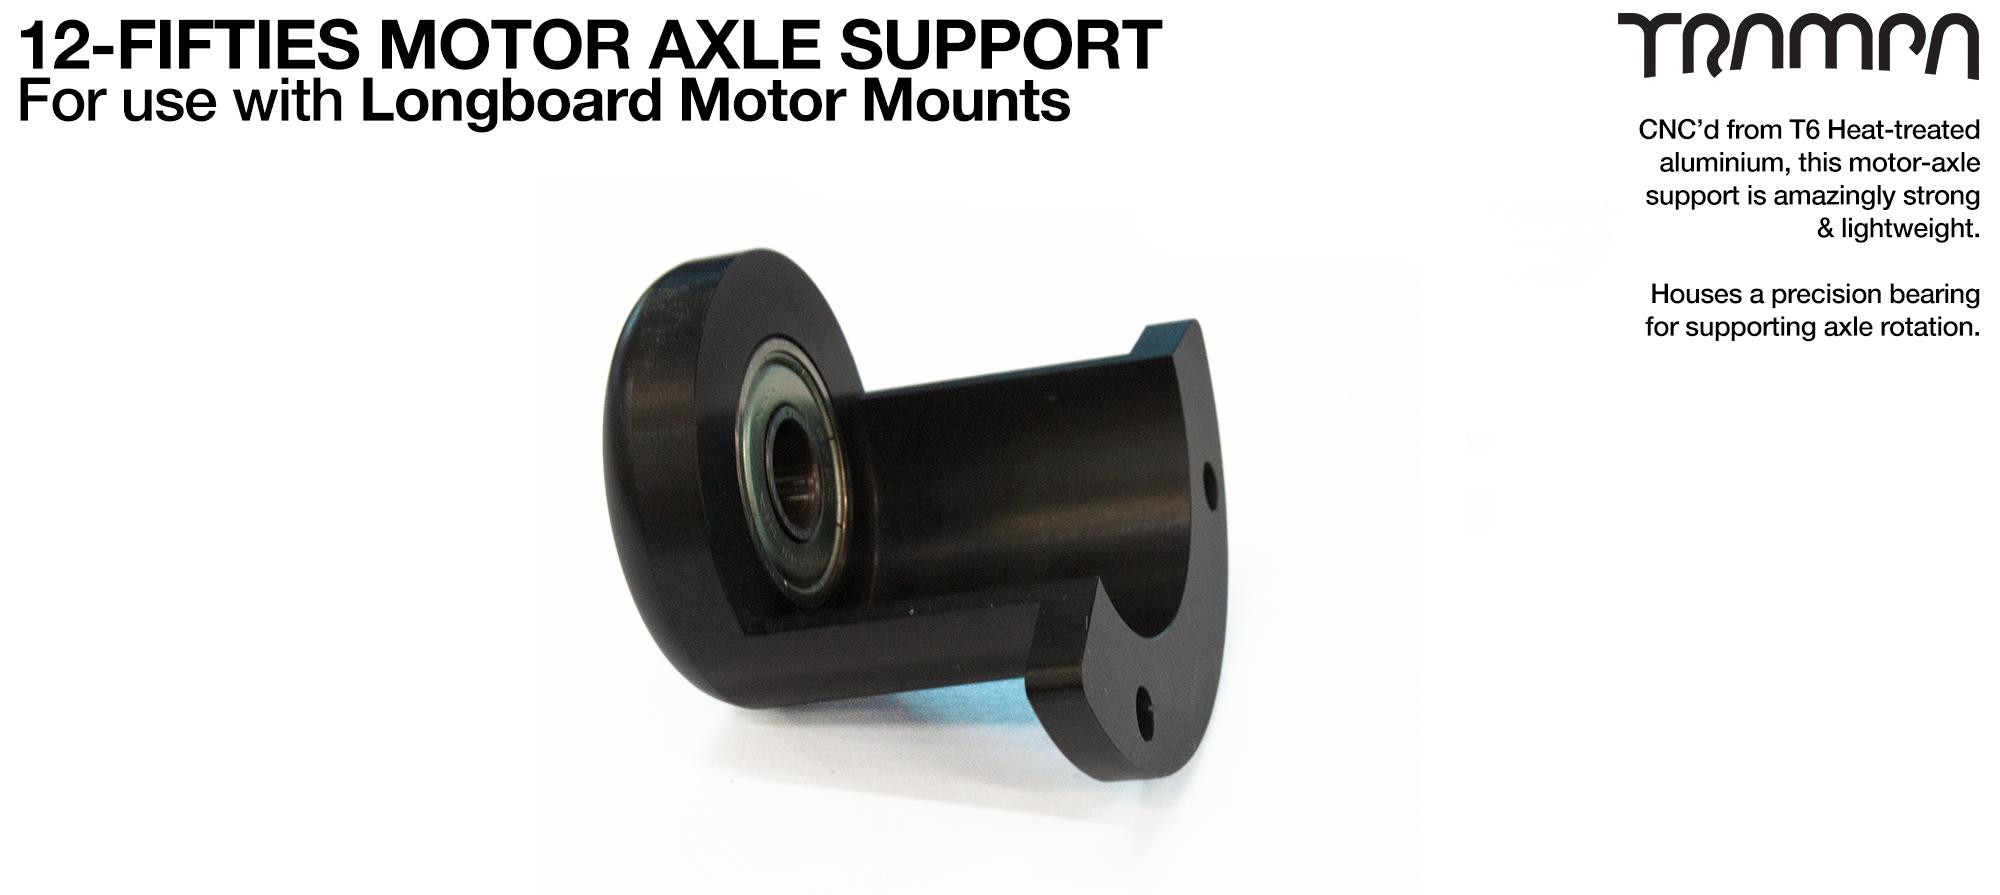 Motor Axle Support for 12FIFTIES Trucks Motor Mount